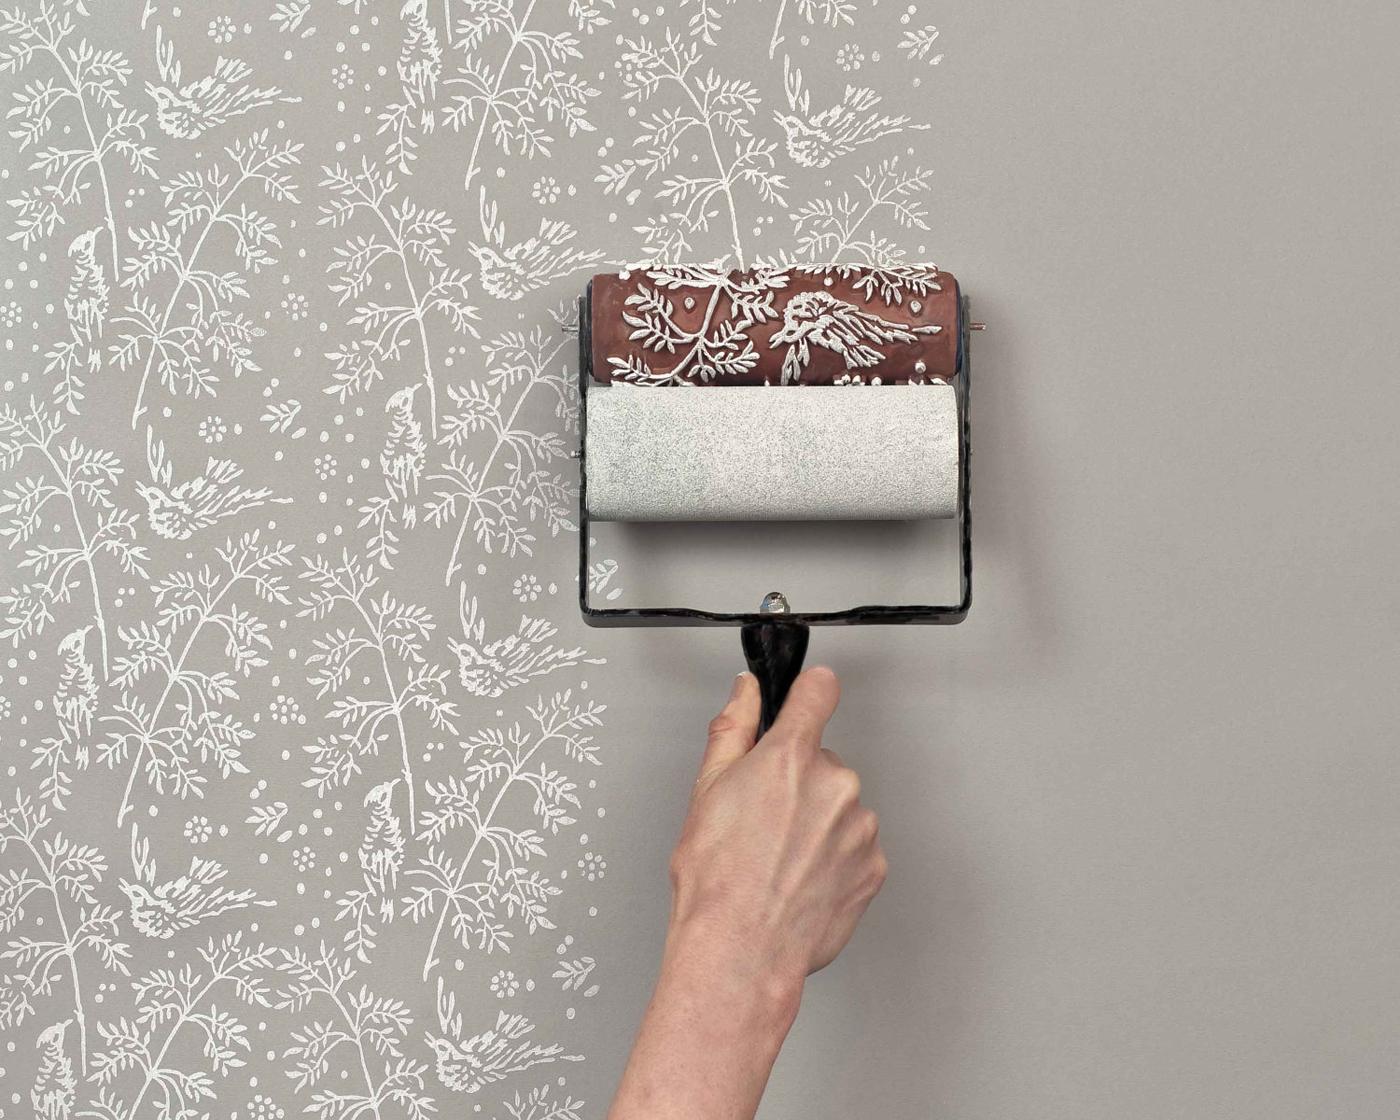 Wallpaper Paint The Paint Roller That Creates A Wallpaper Look 1400x1120